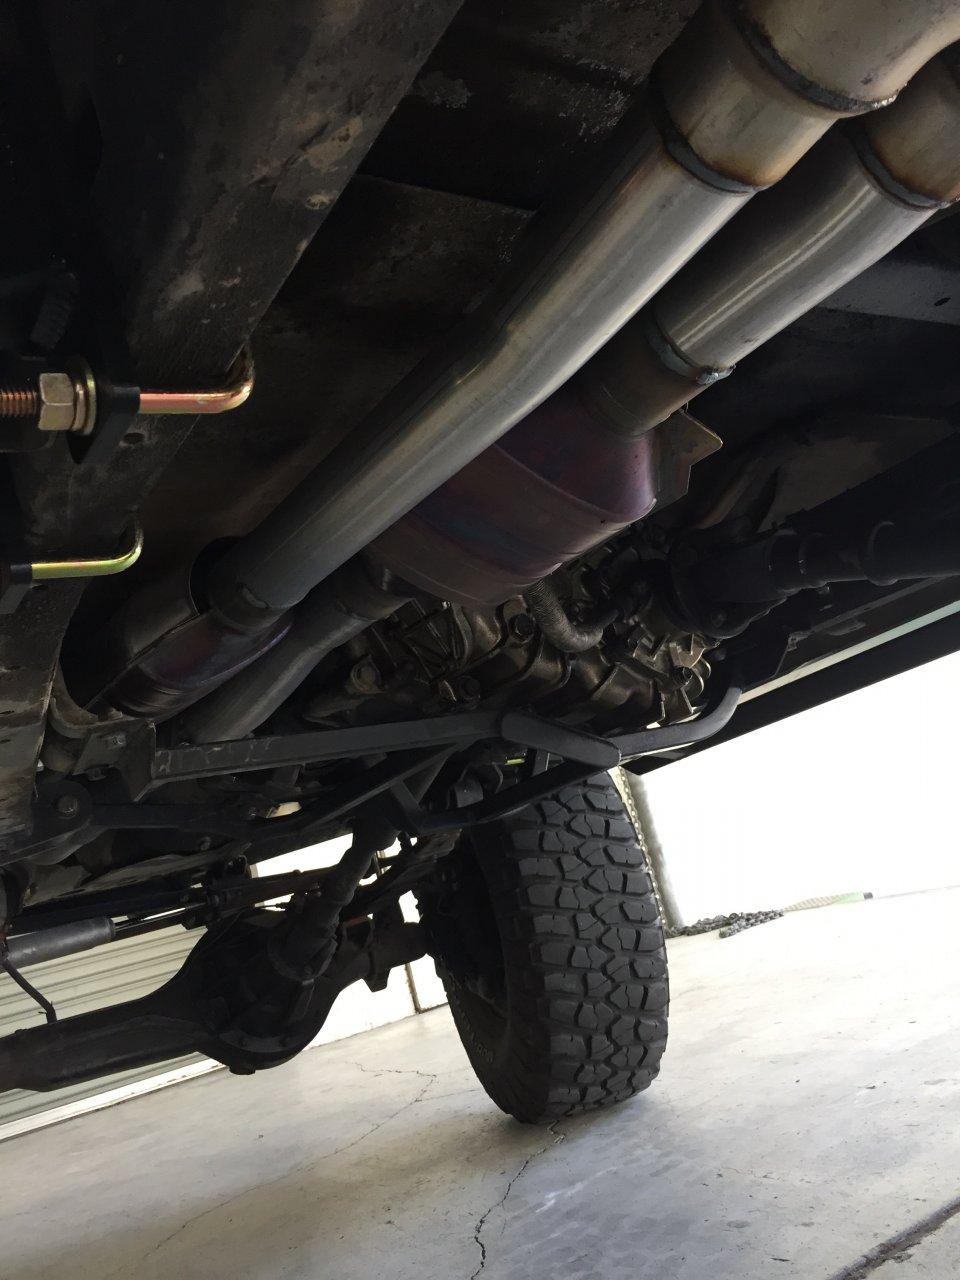 Fj62 2 5 inch exhaust performance problems | IH8MUD Forum